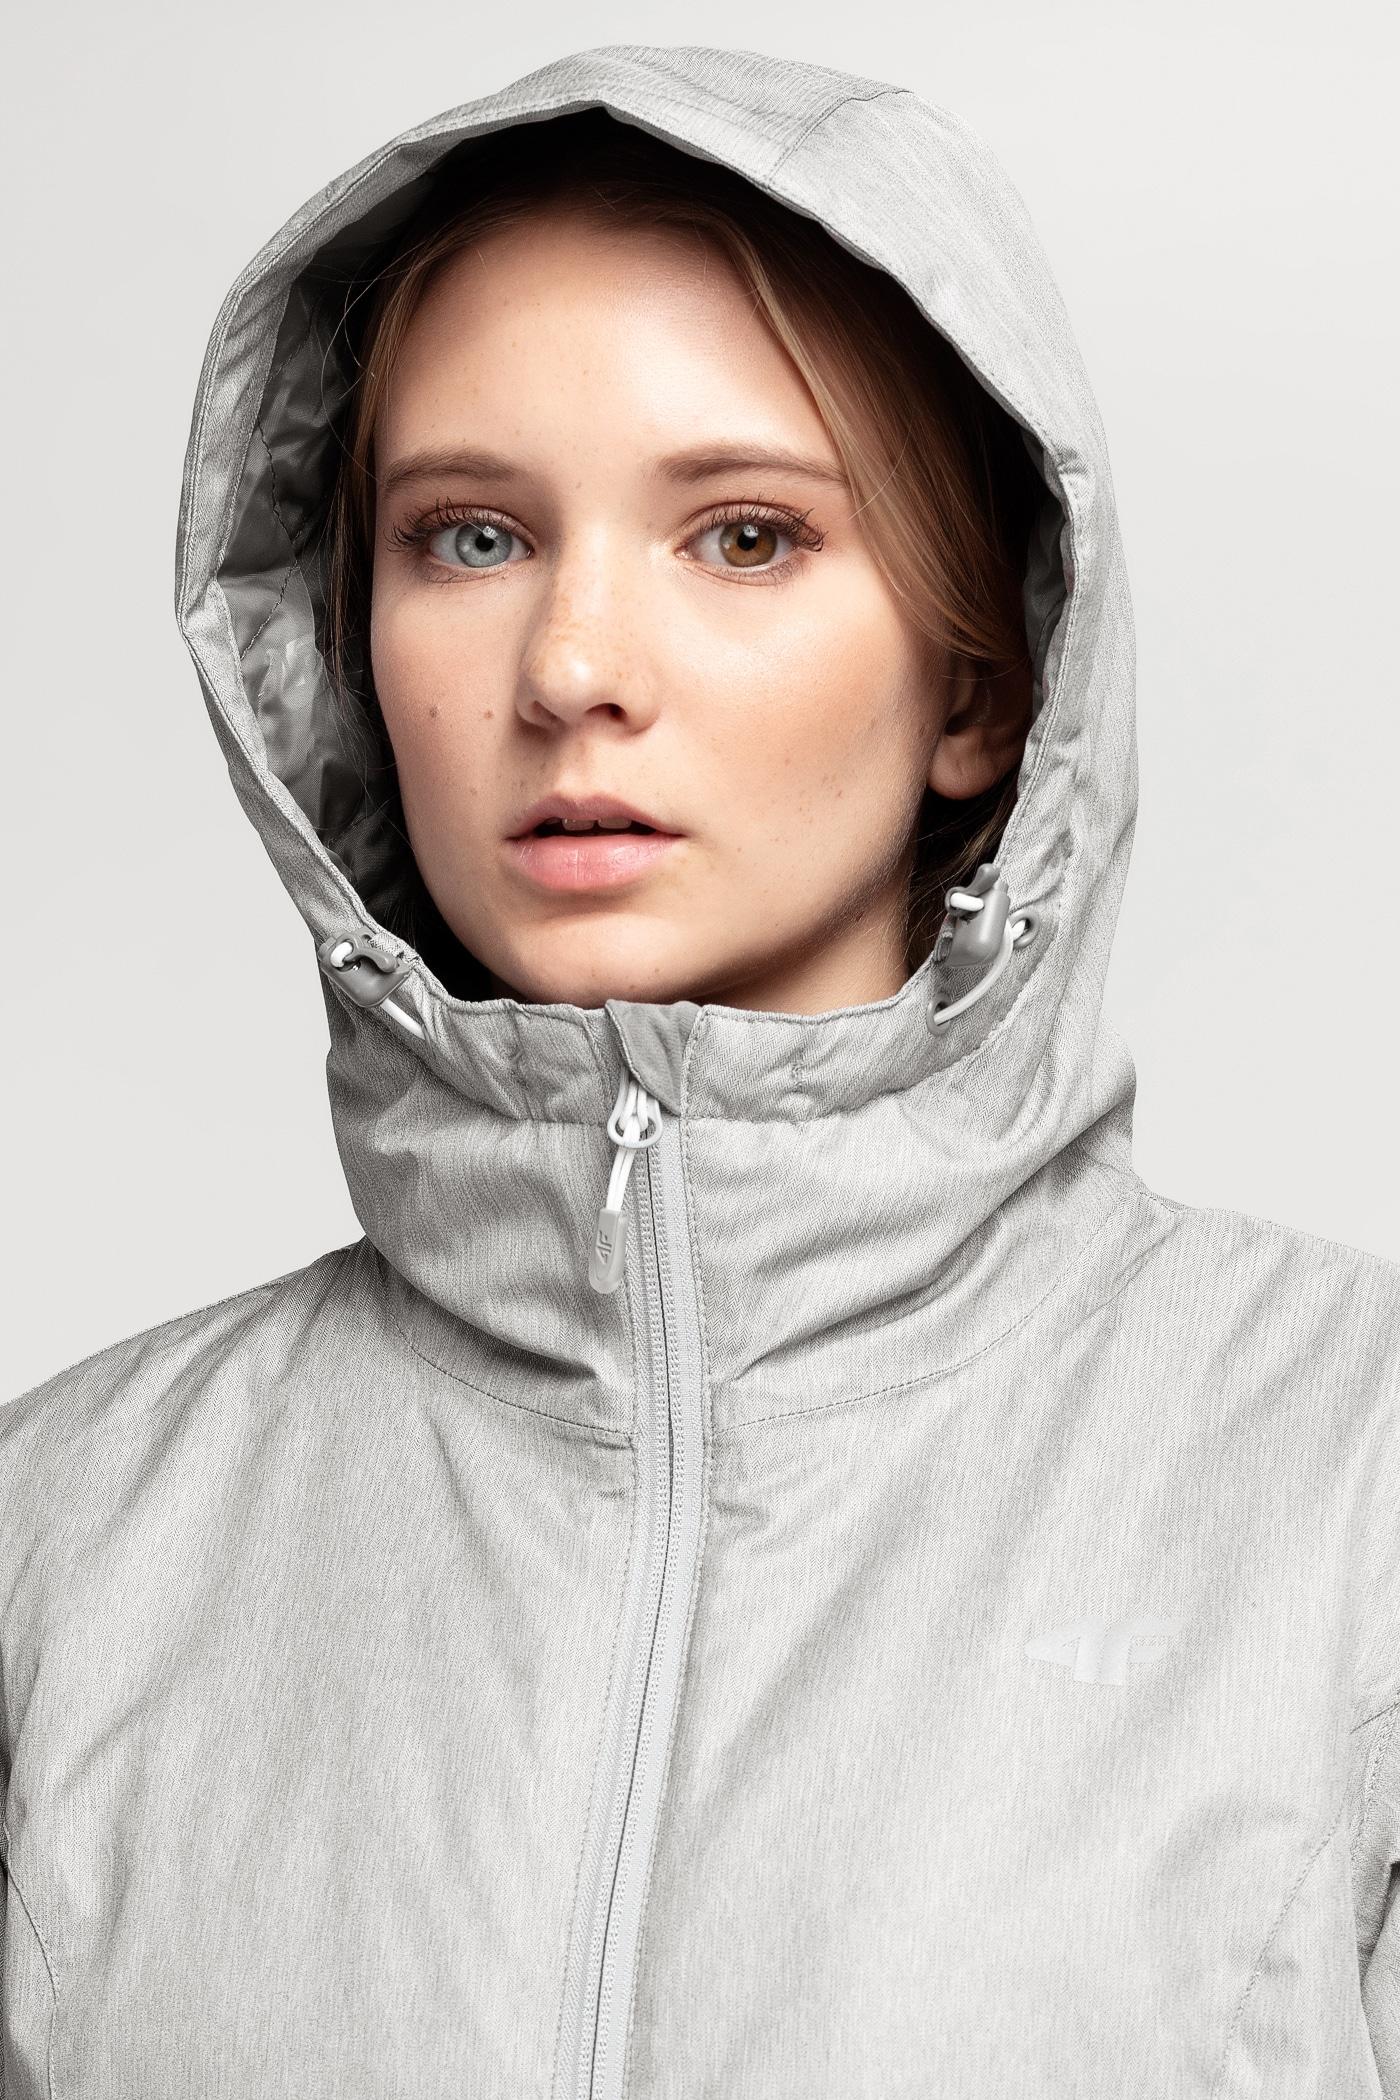 a5ba41edbce607 Kurtka narciarska damska KUDN002 - chłodny jasny szary melanż